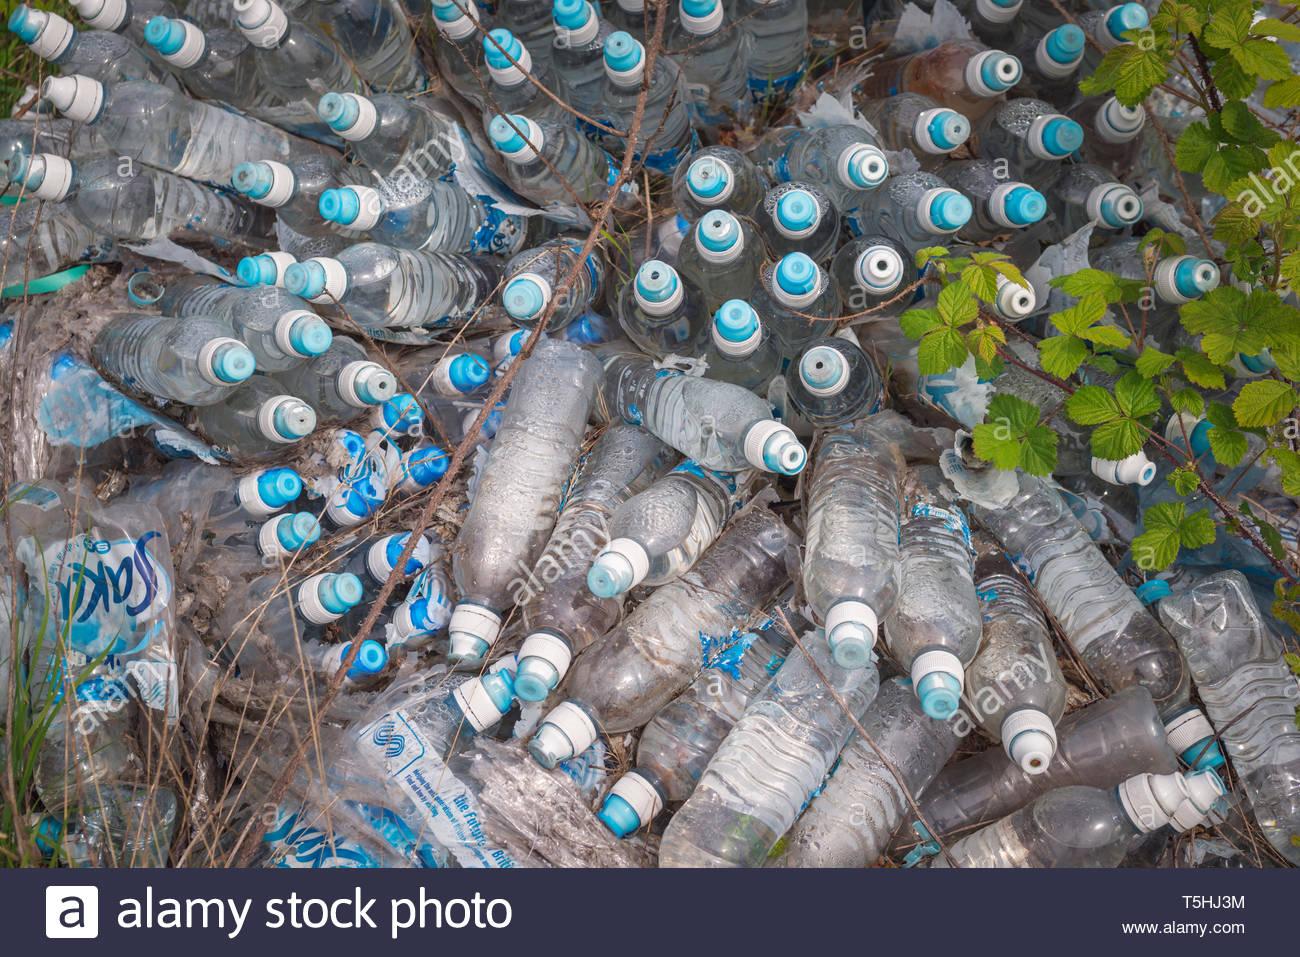 Unused bottles of mineral water dumped on wasteland, Birmingham, UK. - Stock Image